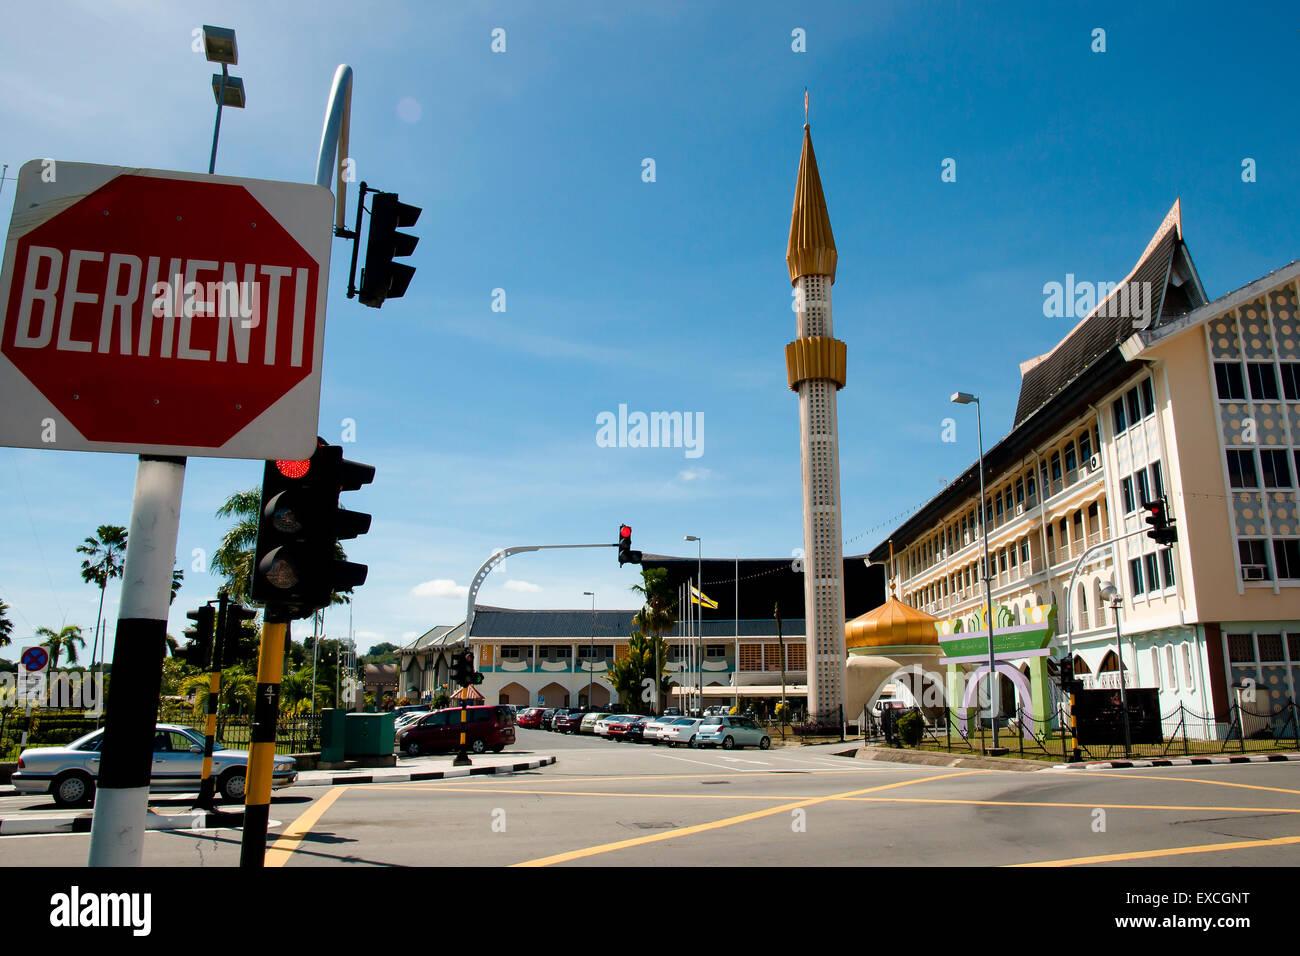 Bandar Seri Begawan - Brunei - Stock Image